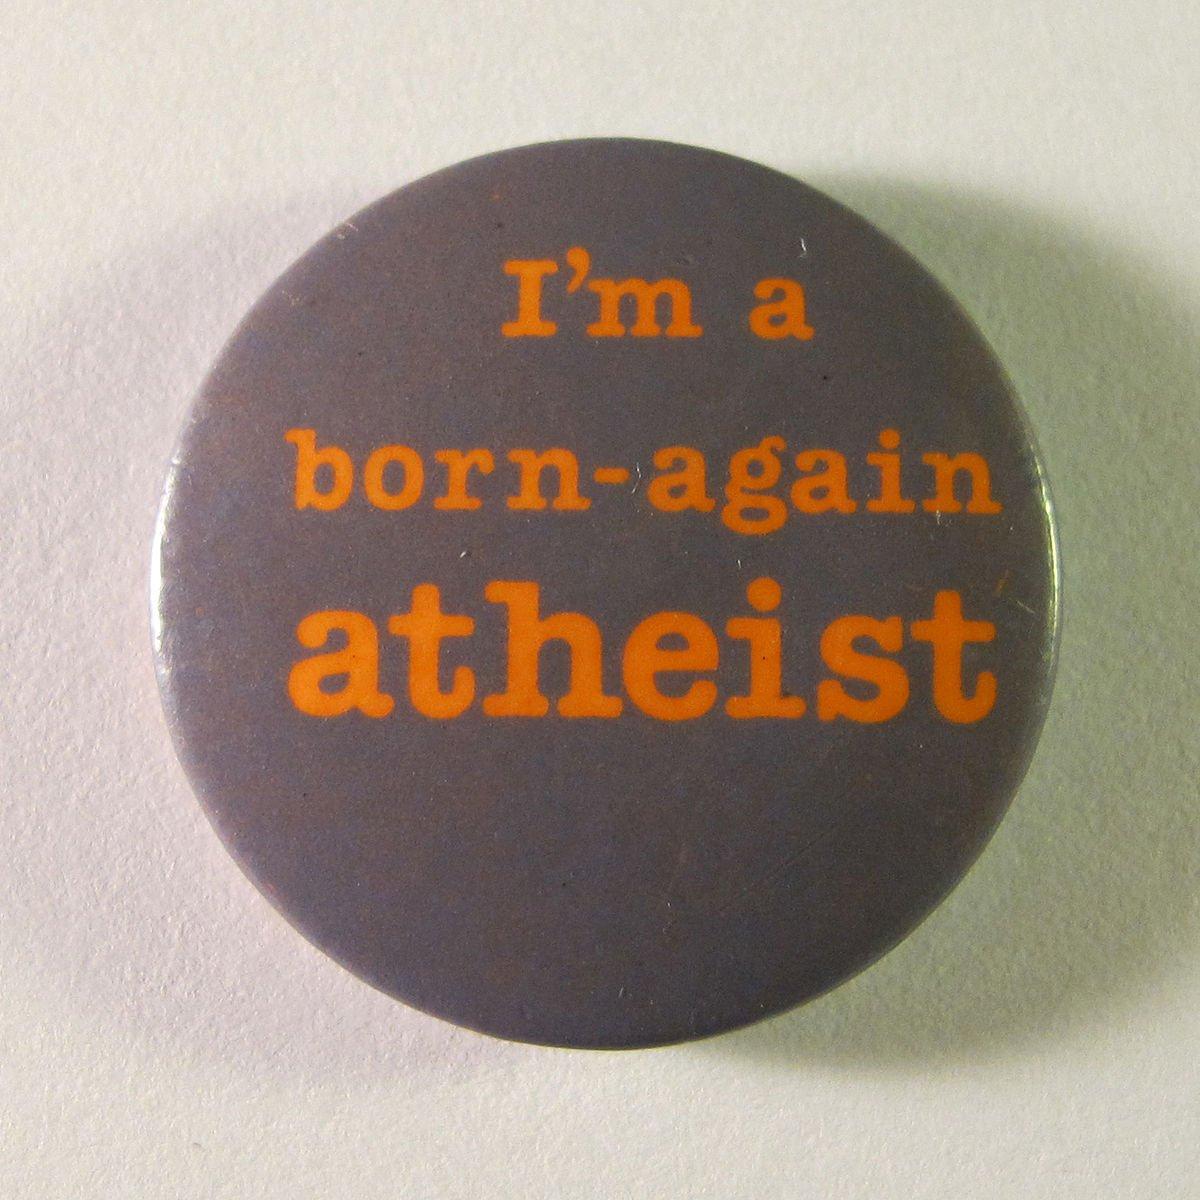 """I'm a born-again atheist"" button. Photo via Wikimedia Commons."